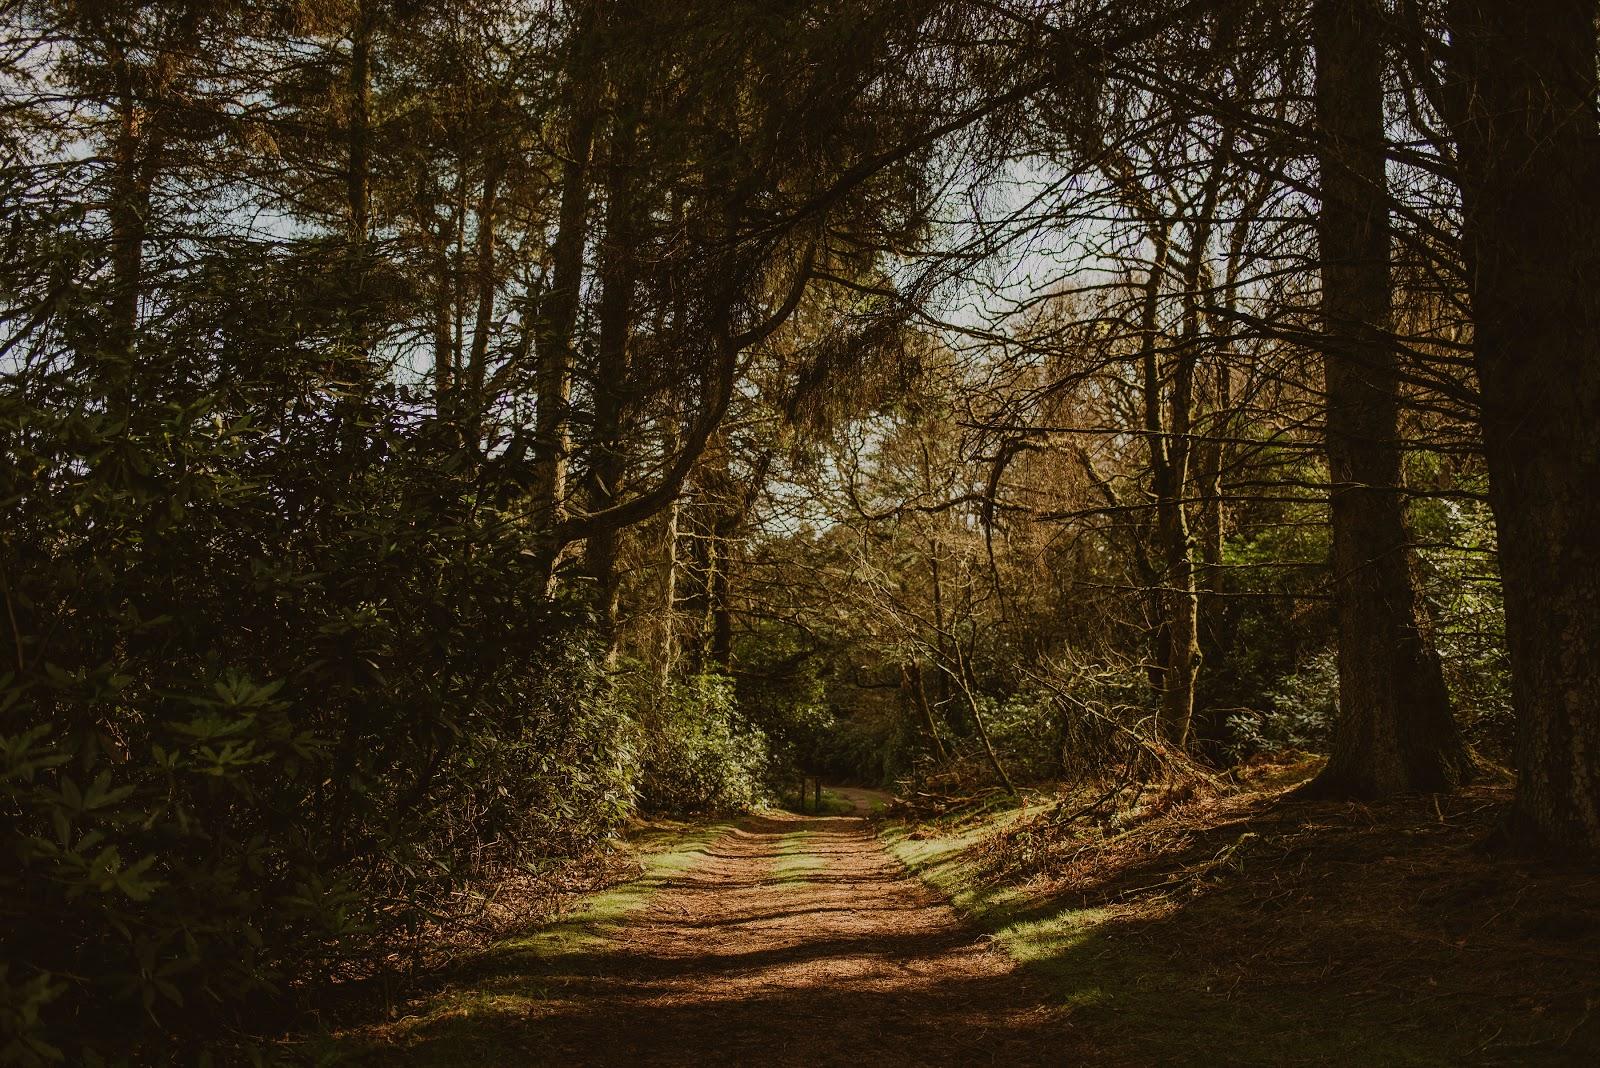 Dunksey Estate grounds